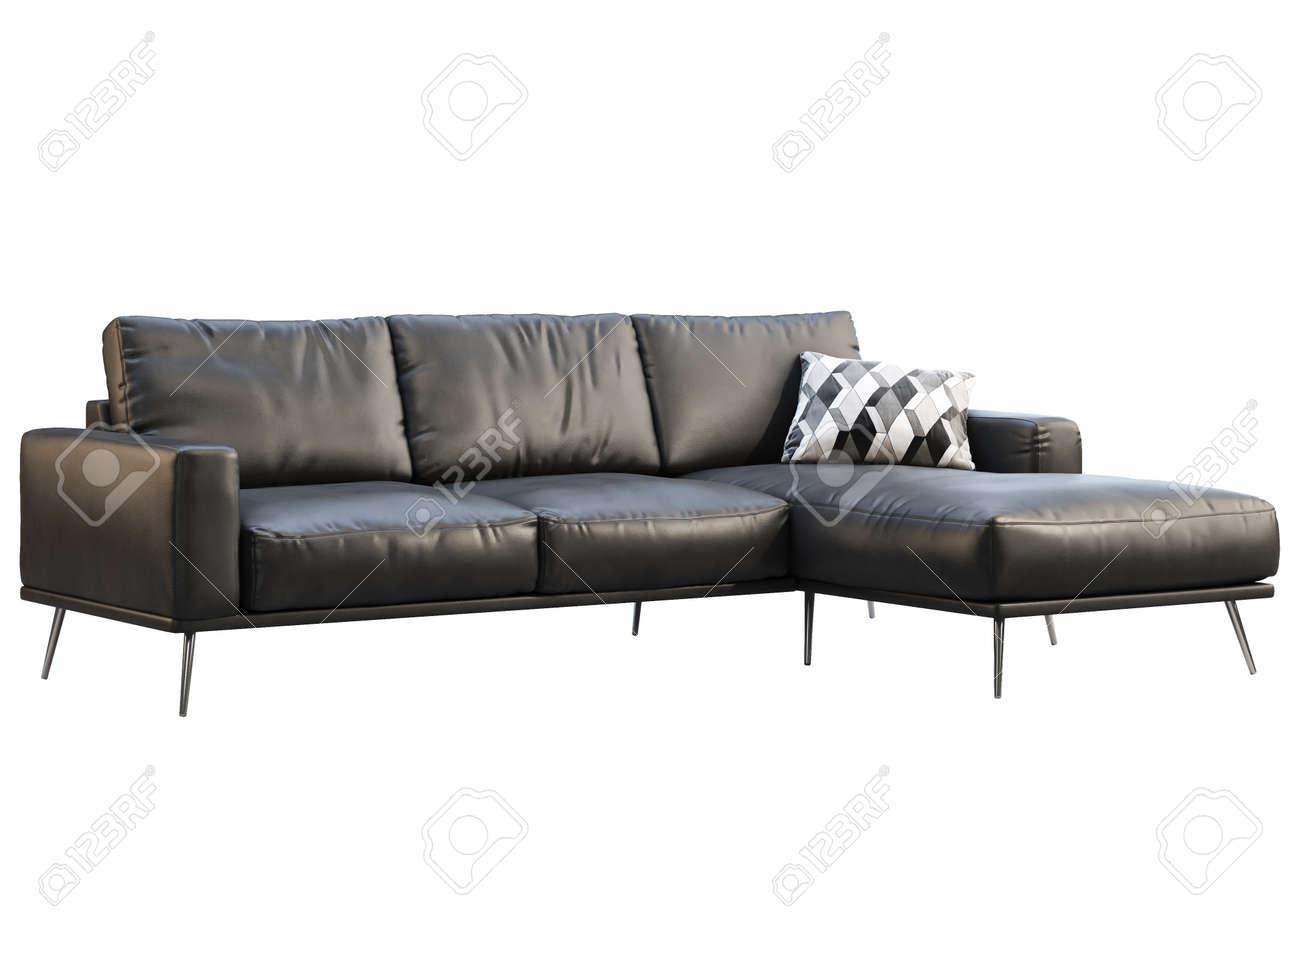 modern chaise lounge sofa black leather corner sofa with metal legs on white background mid century modern loft chalet scandinavian interior 3d